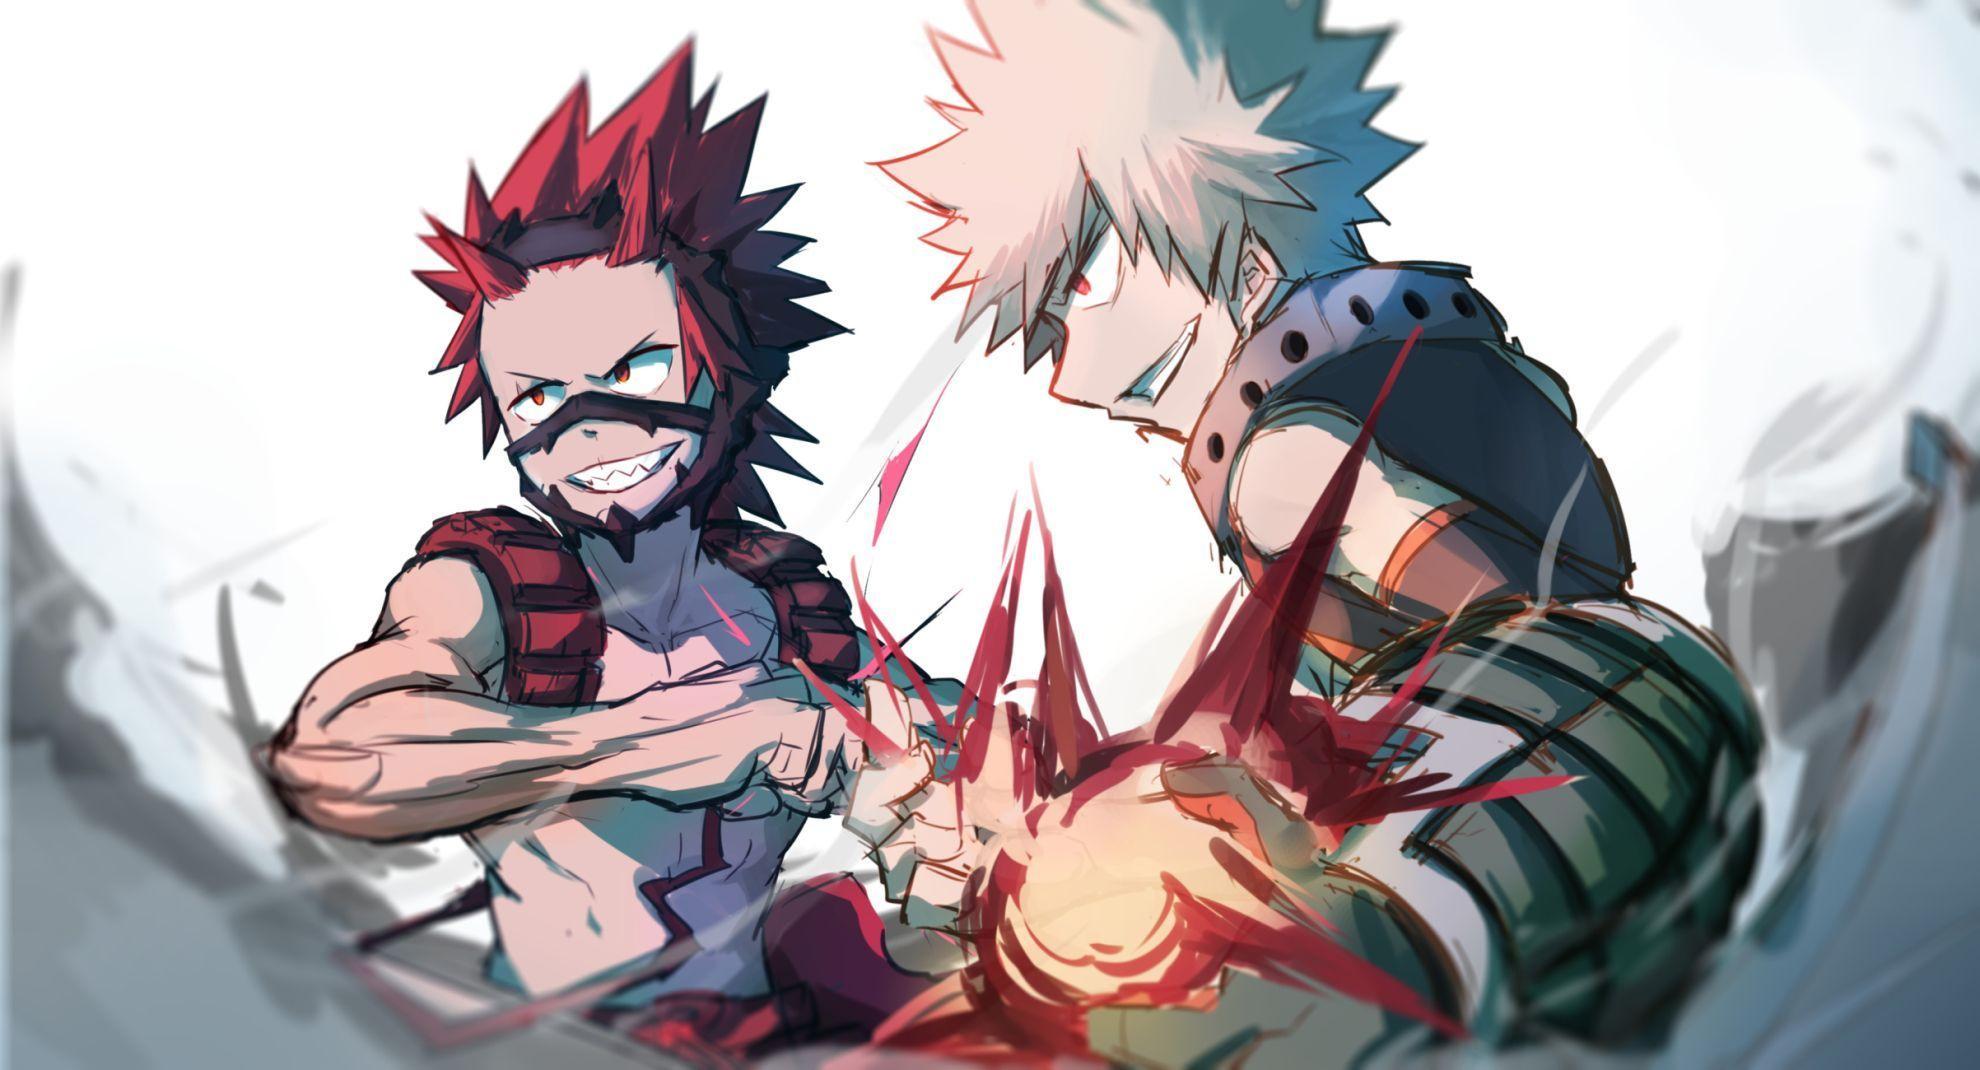 Posted in anime wallpaper culture wallpaper superhero. Red Riot Unbreakable Desktop Wallpapers - Wallpaper Cave